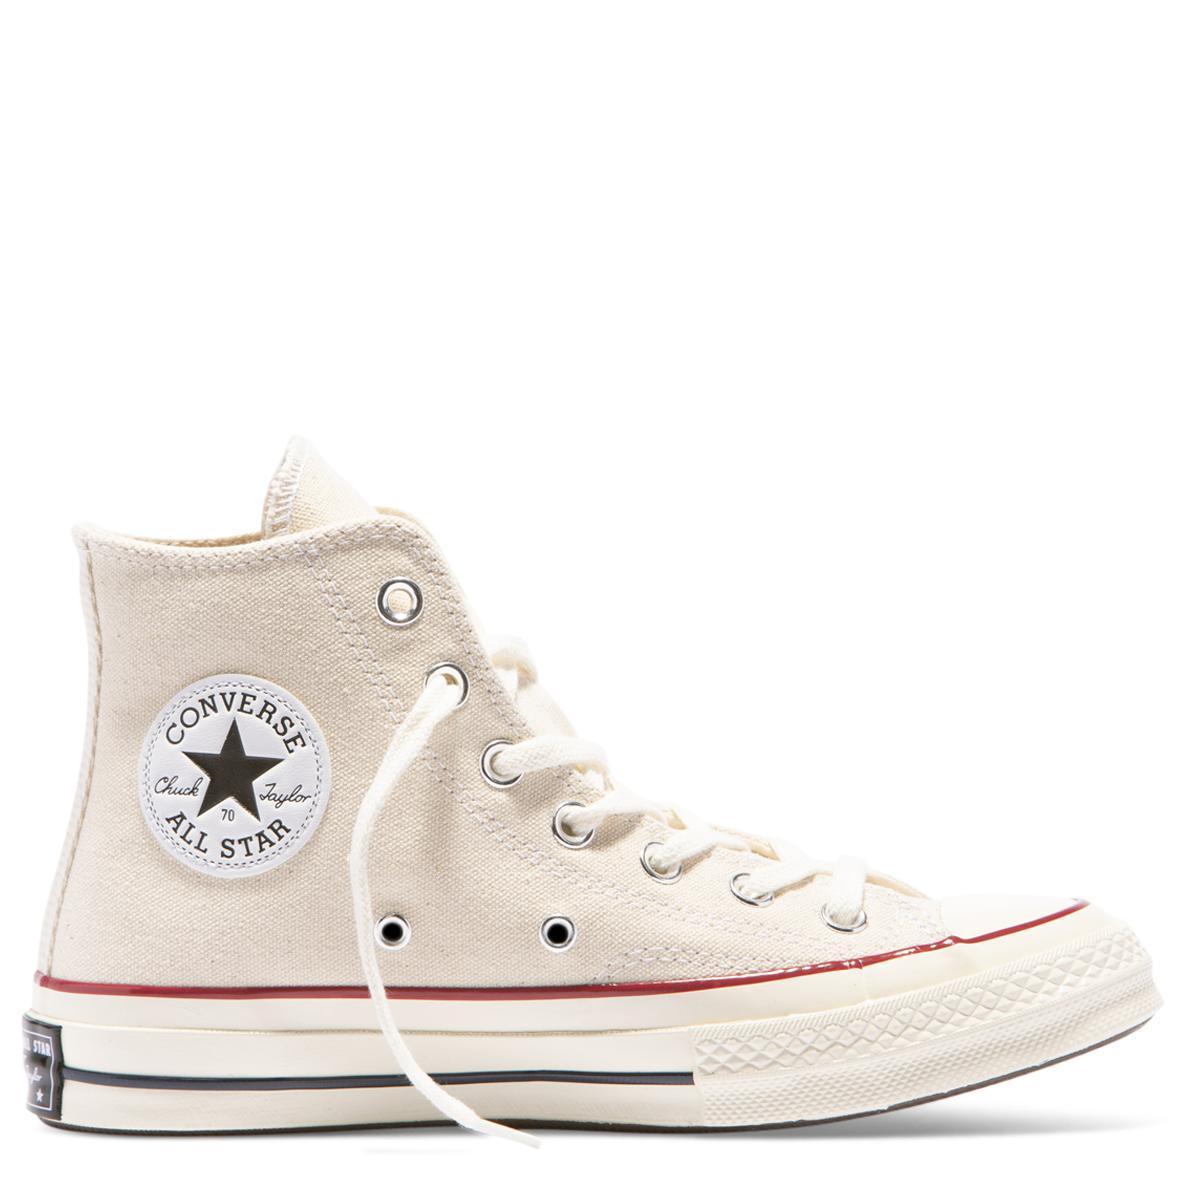 Converse Chuck Taylor All Star 70 High Top Sepatu Sneakers Pria Cream Wanita Vr 276 Kets Dan Casual Navy